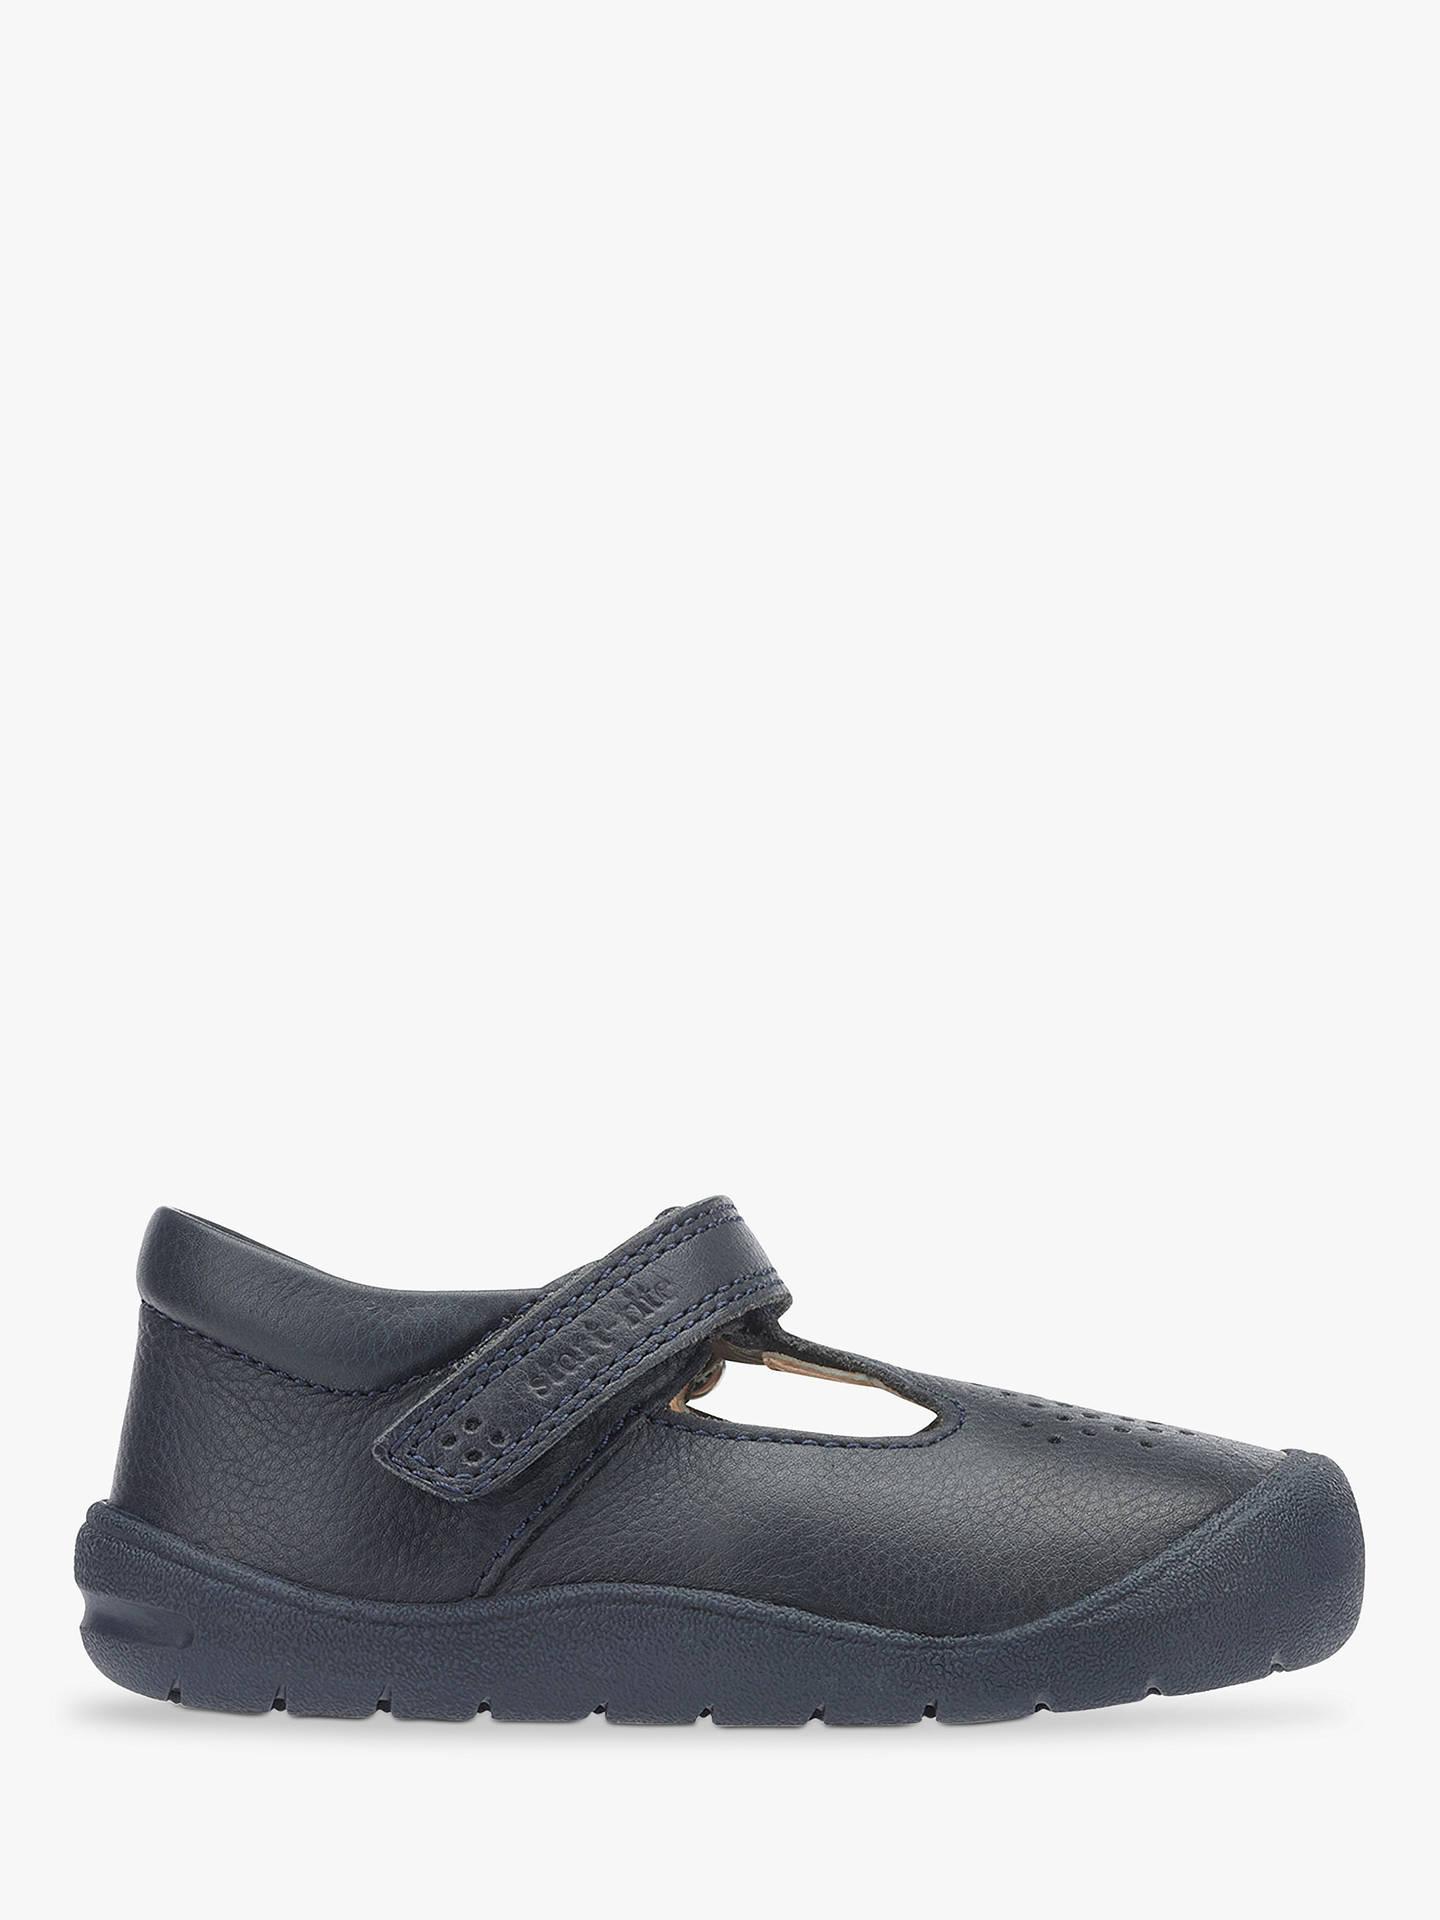 b719e46e2fa77 Buy Start-rite Children's Alex First Shoes, Navy, 4E Jnr Online at  johnlewis ...